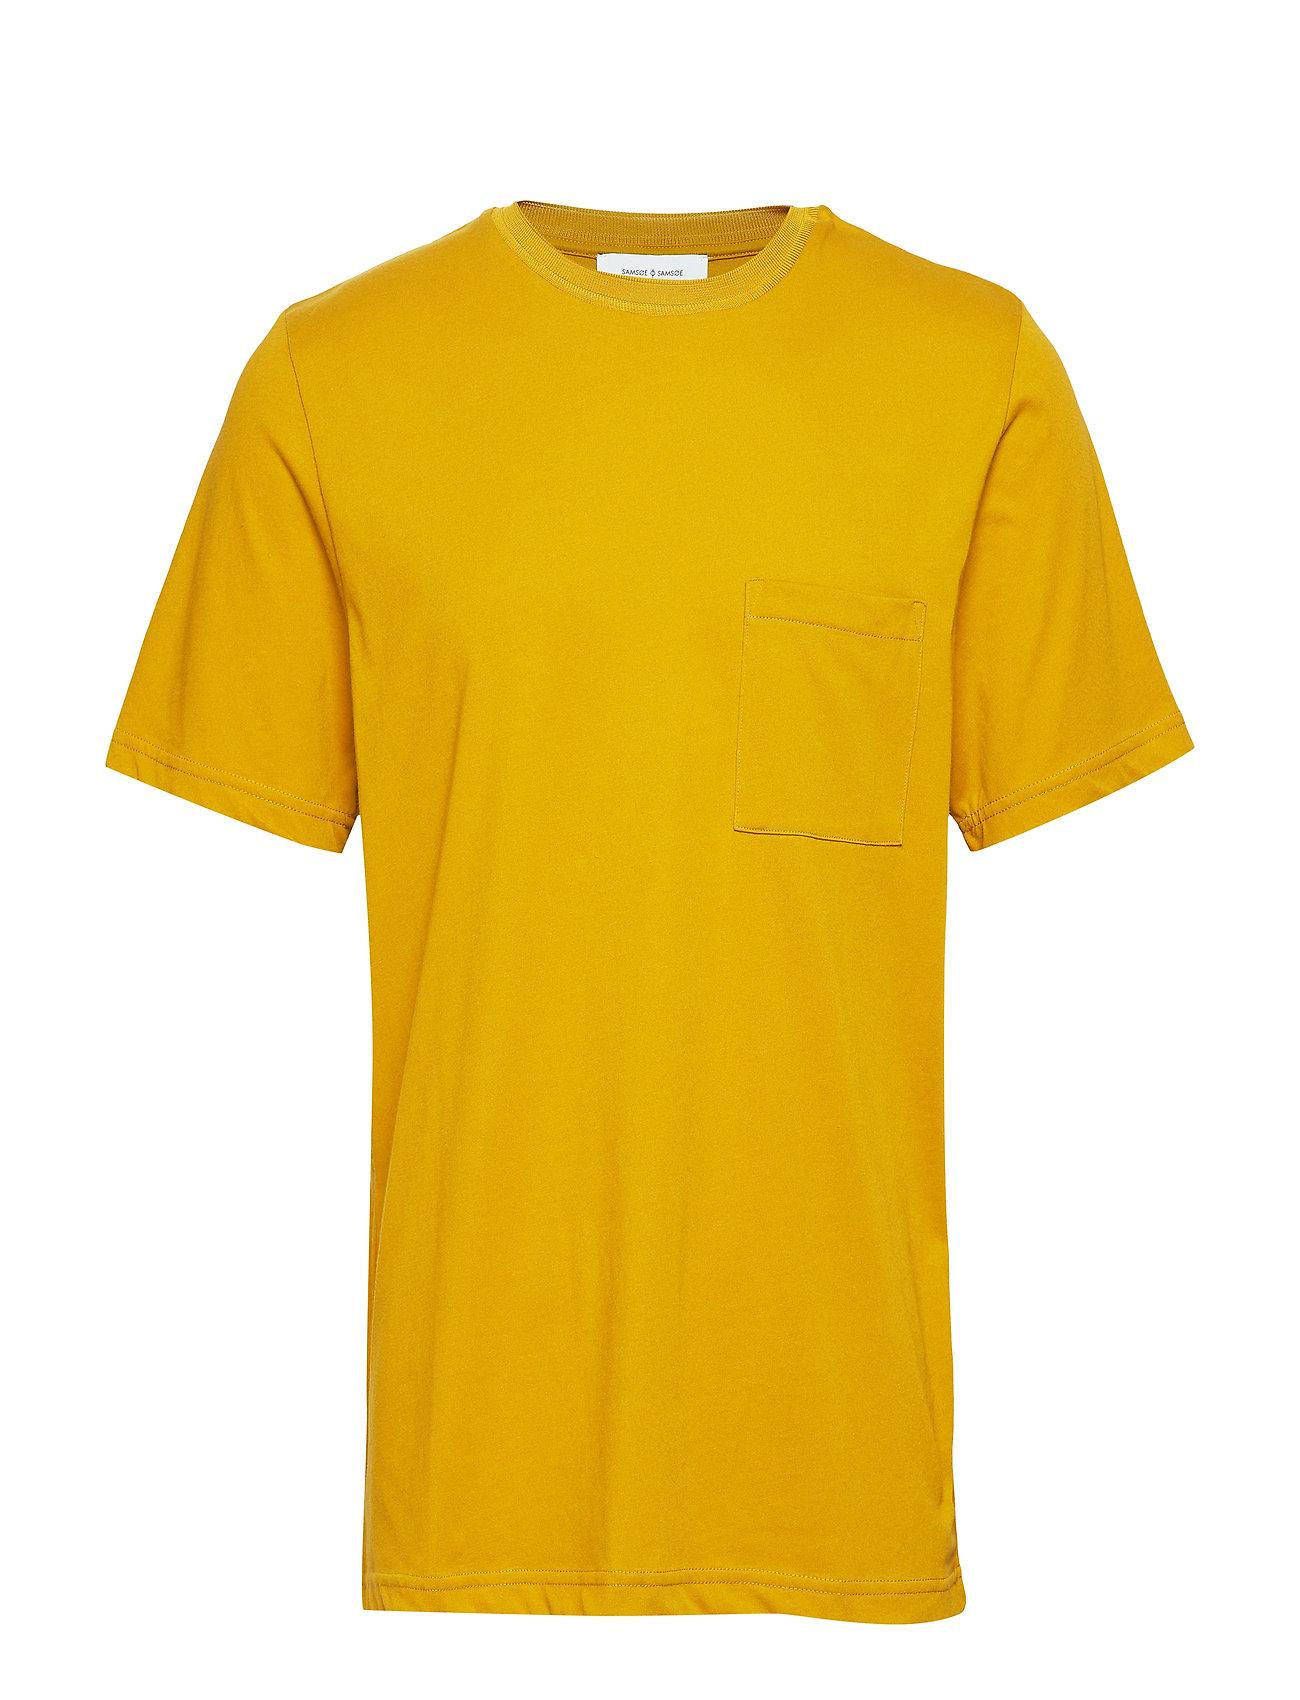 Samsøe & Samsøe Bevtoft t-shirt 10964 - OLIVE OIL